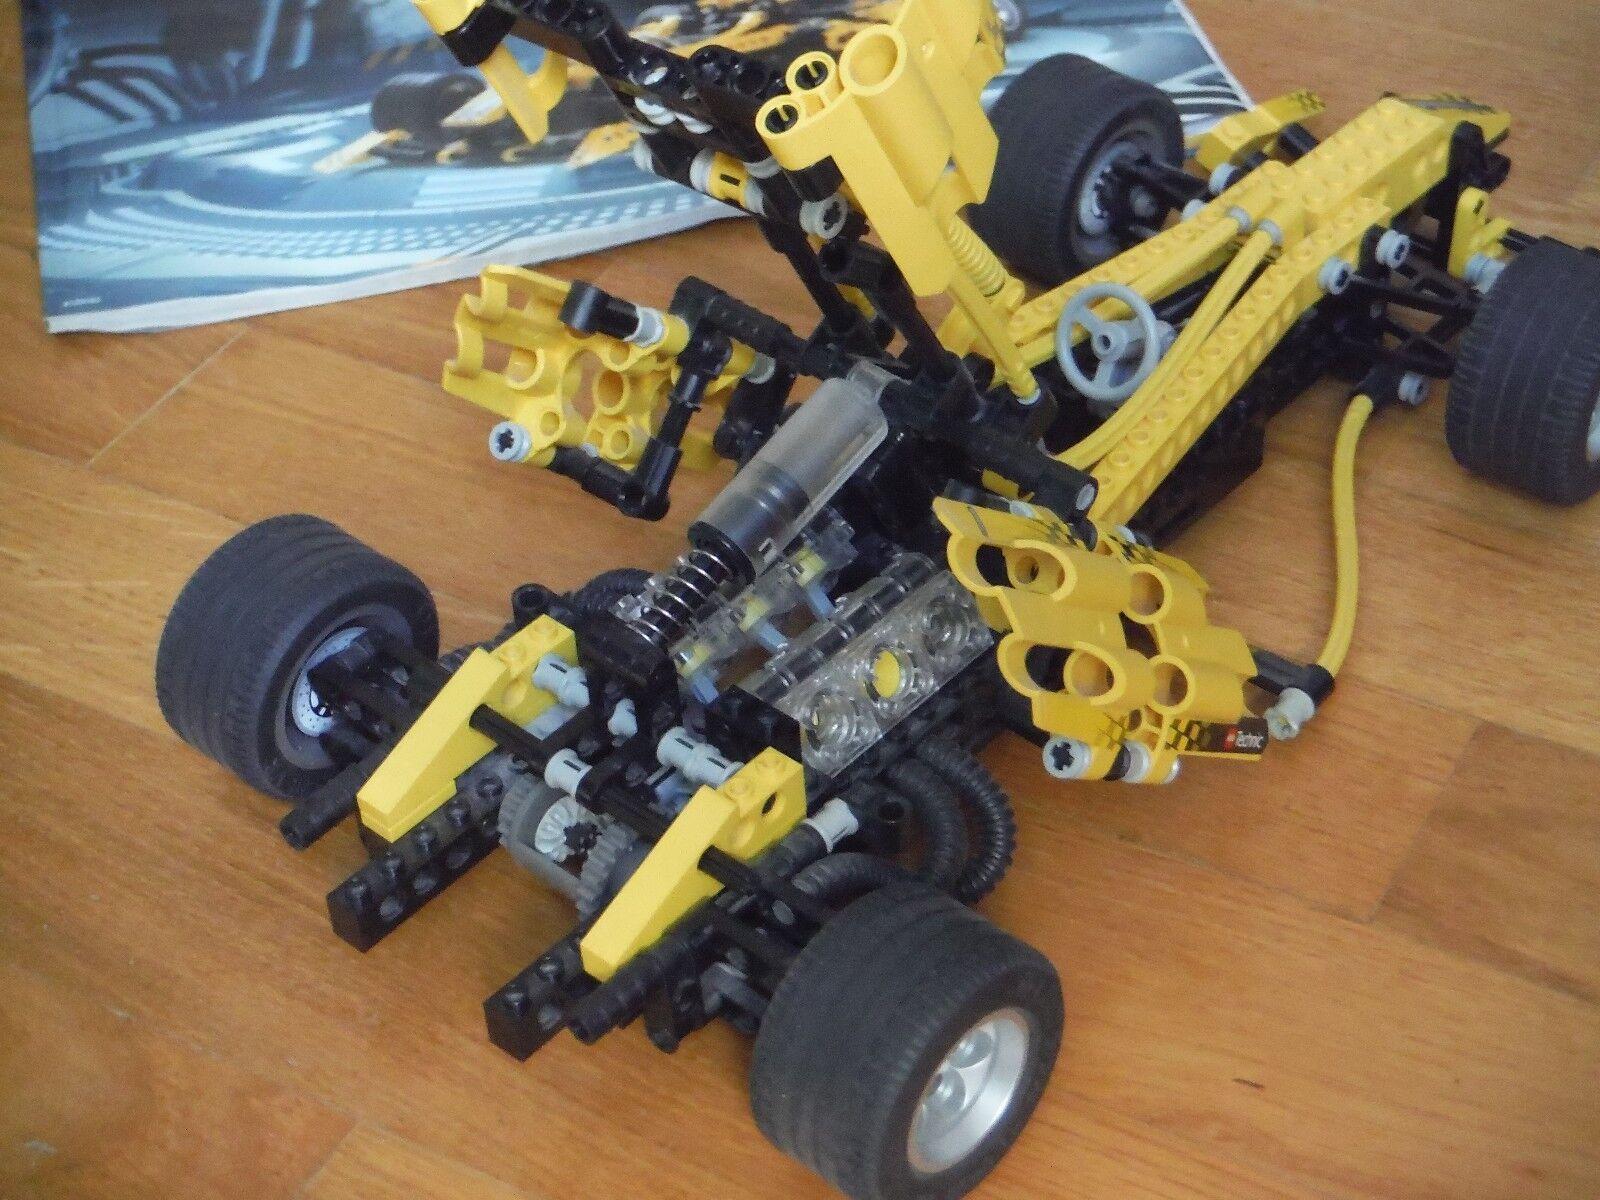 SET LEGO LEGO LEGO TECHNIC 8445 RACE CAR FORMULA 1 - COMPLETO 100% - RARITA' cd187a